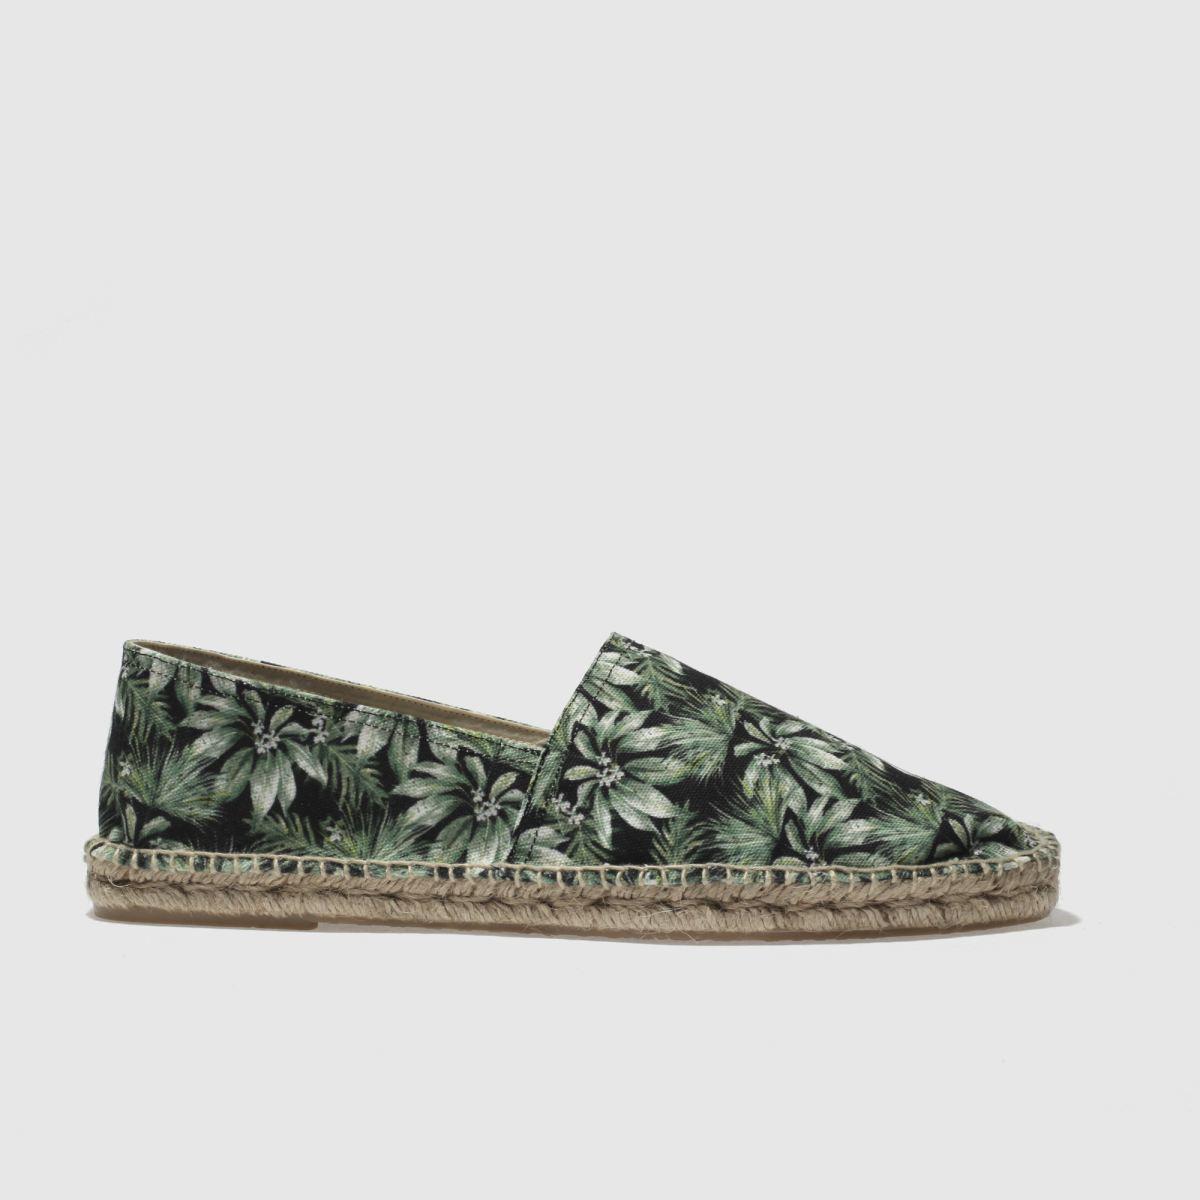 H by Hudson H By Hudson Green Blake Shoes